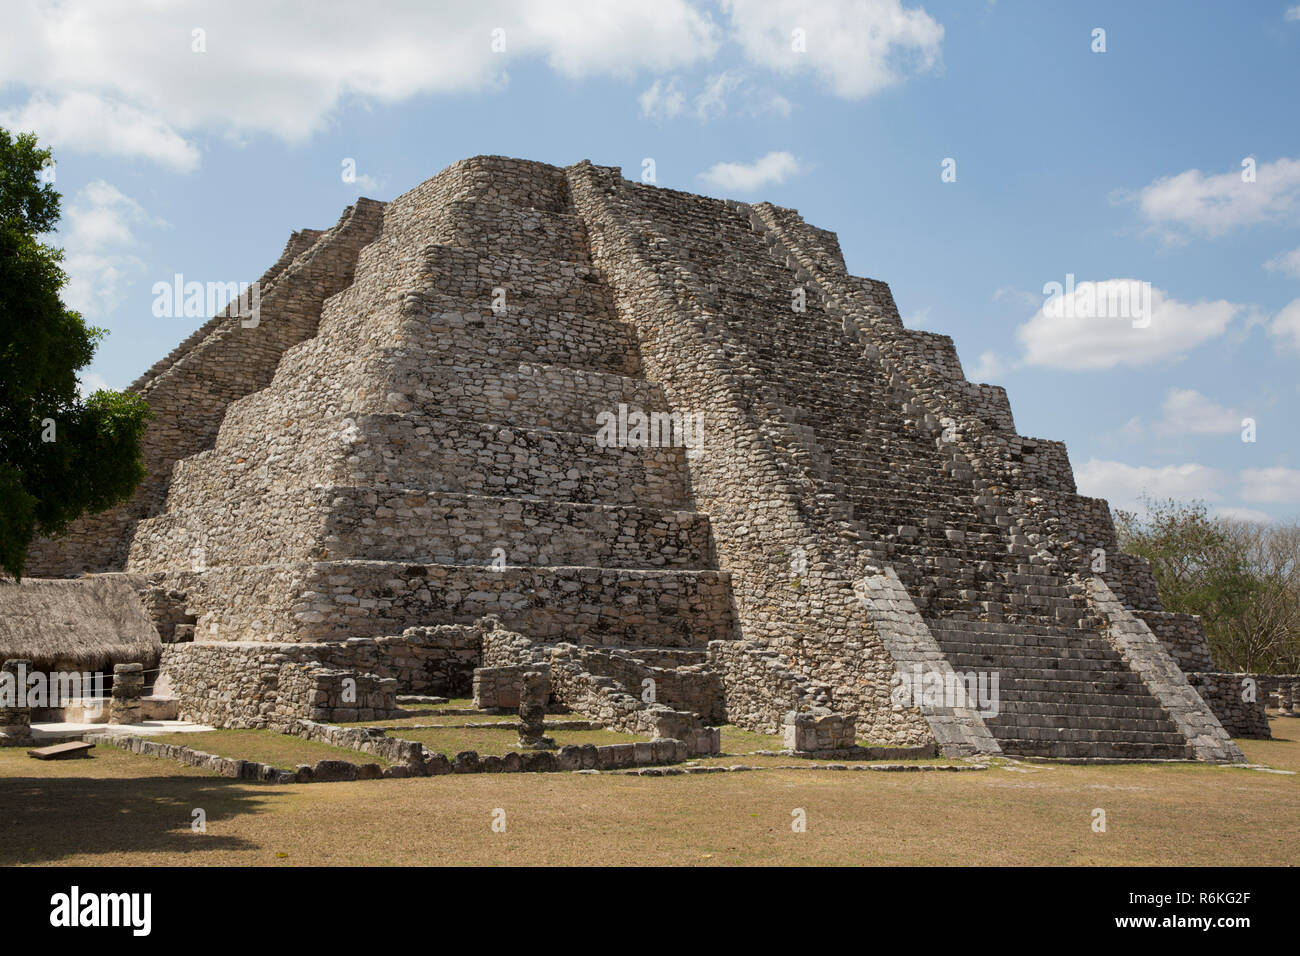 Castle of Kukulcan, Mayan Ruins, Mayapan Archaeological Site, Yucatan, Mexico - Stock Image